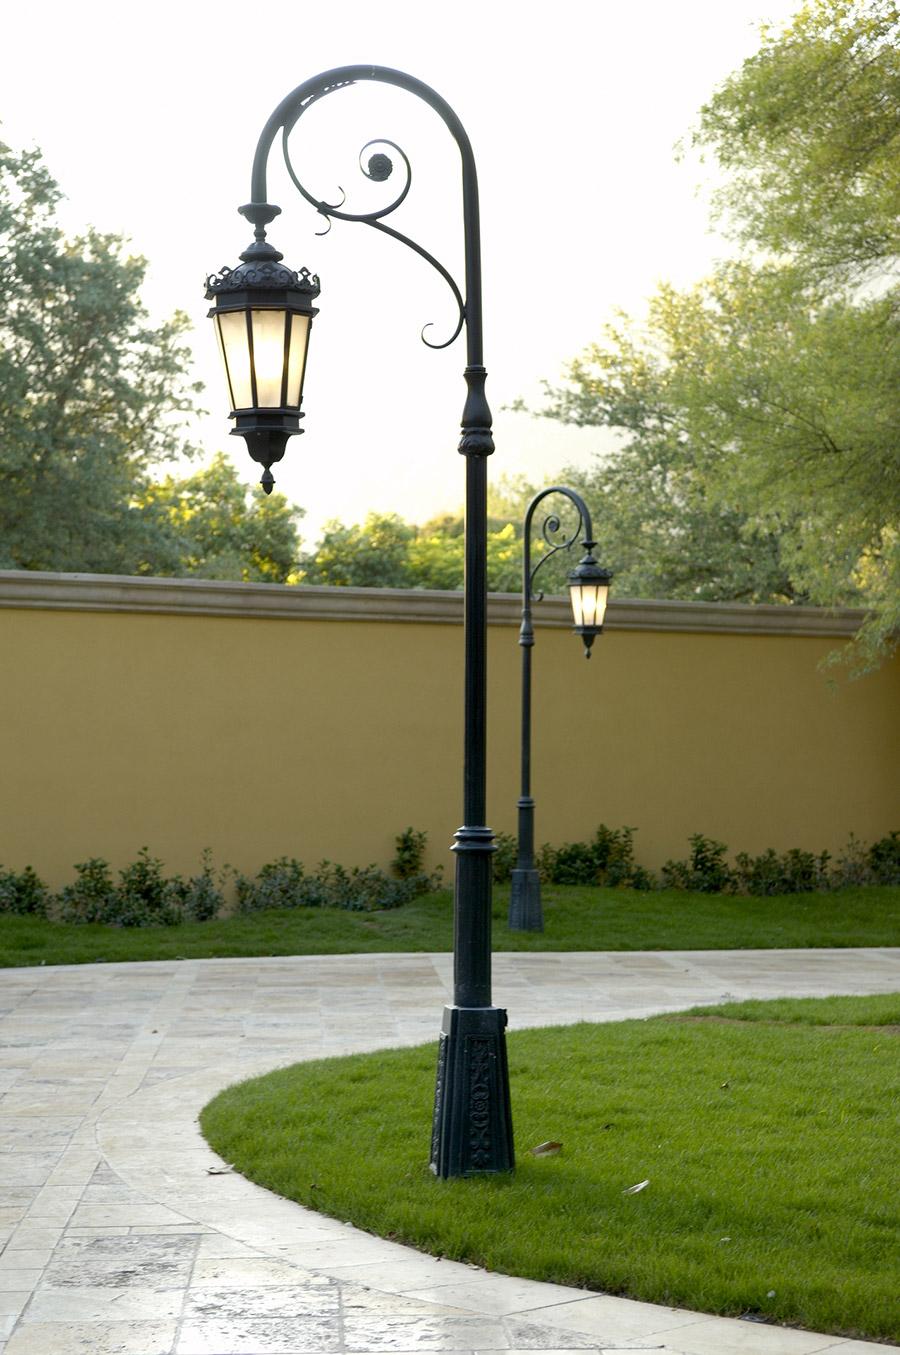 Chianti-OLS-CLA-E-003-classic--outdoor-Steel-Lighting-Post-Santa-Barbara-Residence-(37)